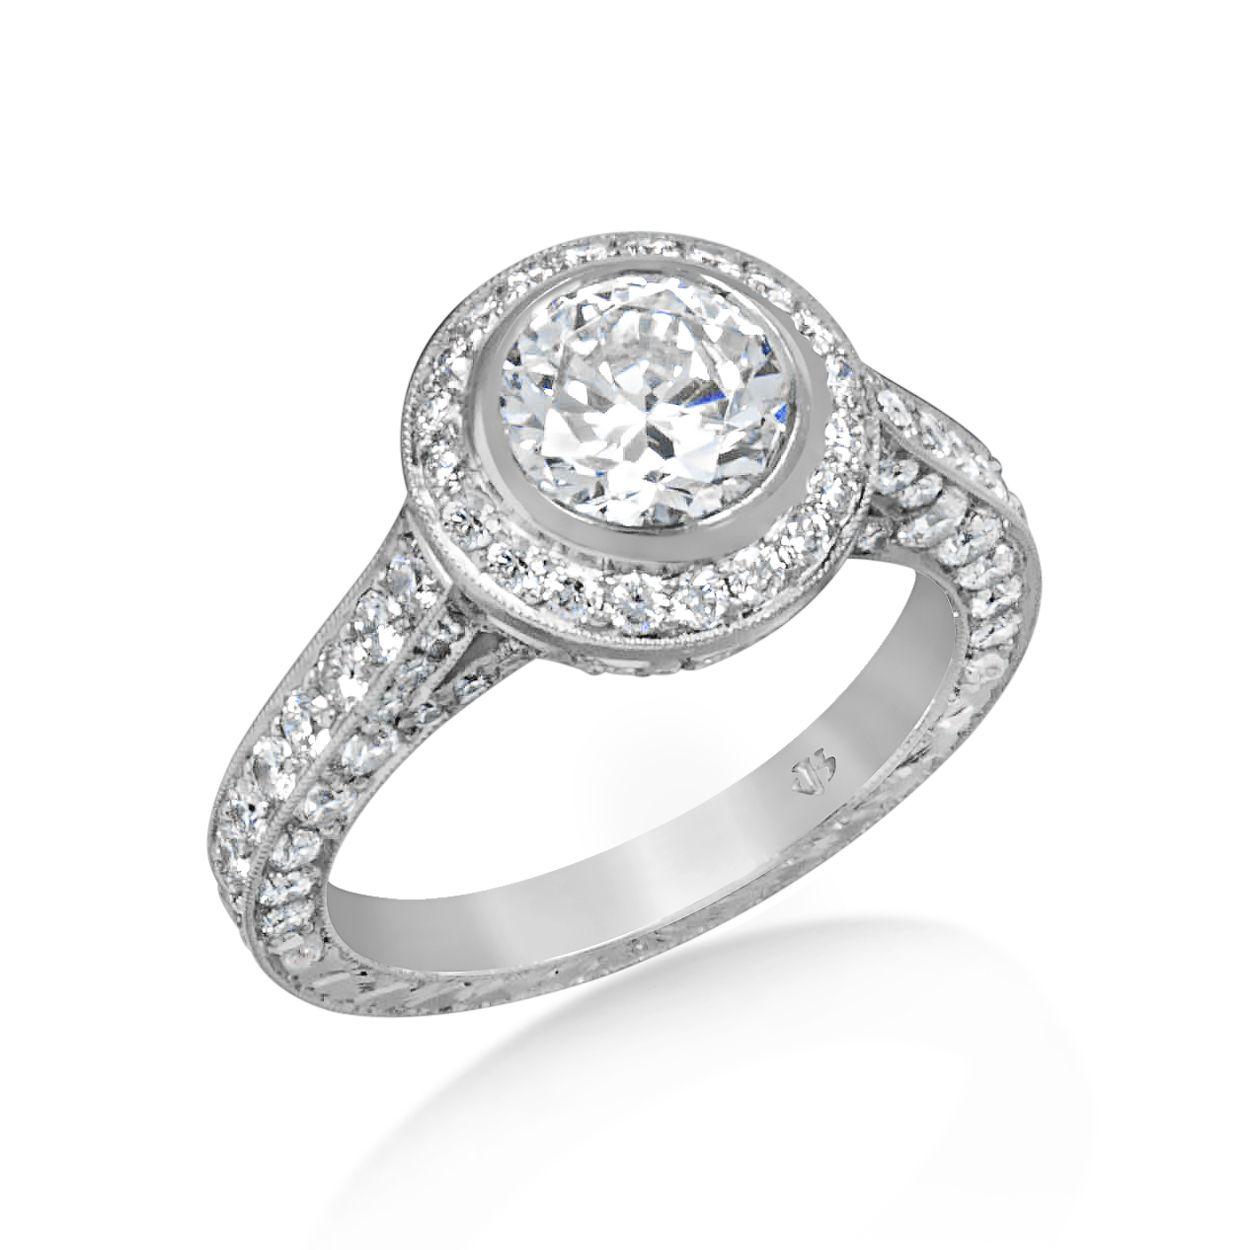 Chicago Bridal Marshall Pierce Company Jack Kelege Halo Diamond Engagement Ring Sale Pric Round Halo Engagement Rings Stunning Engagement Ring Engagement